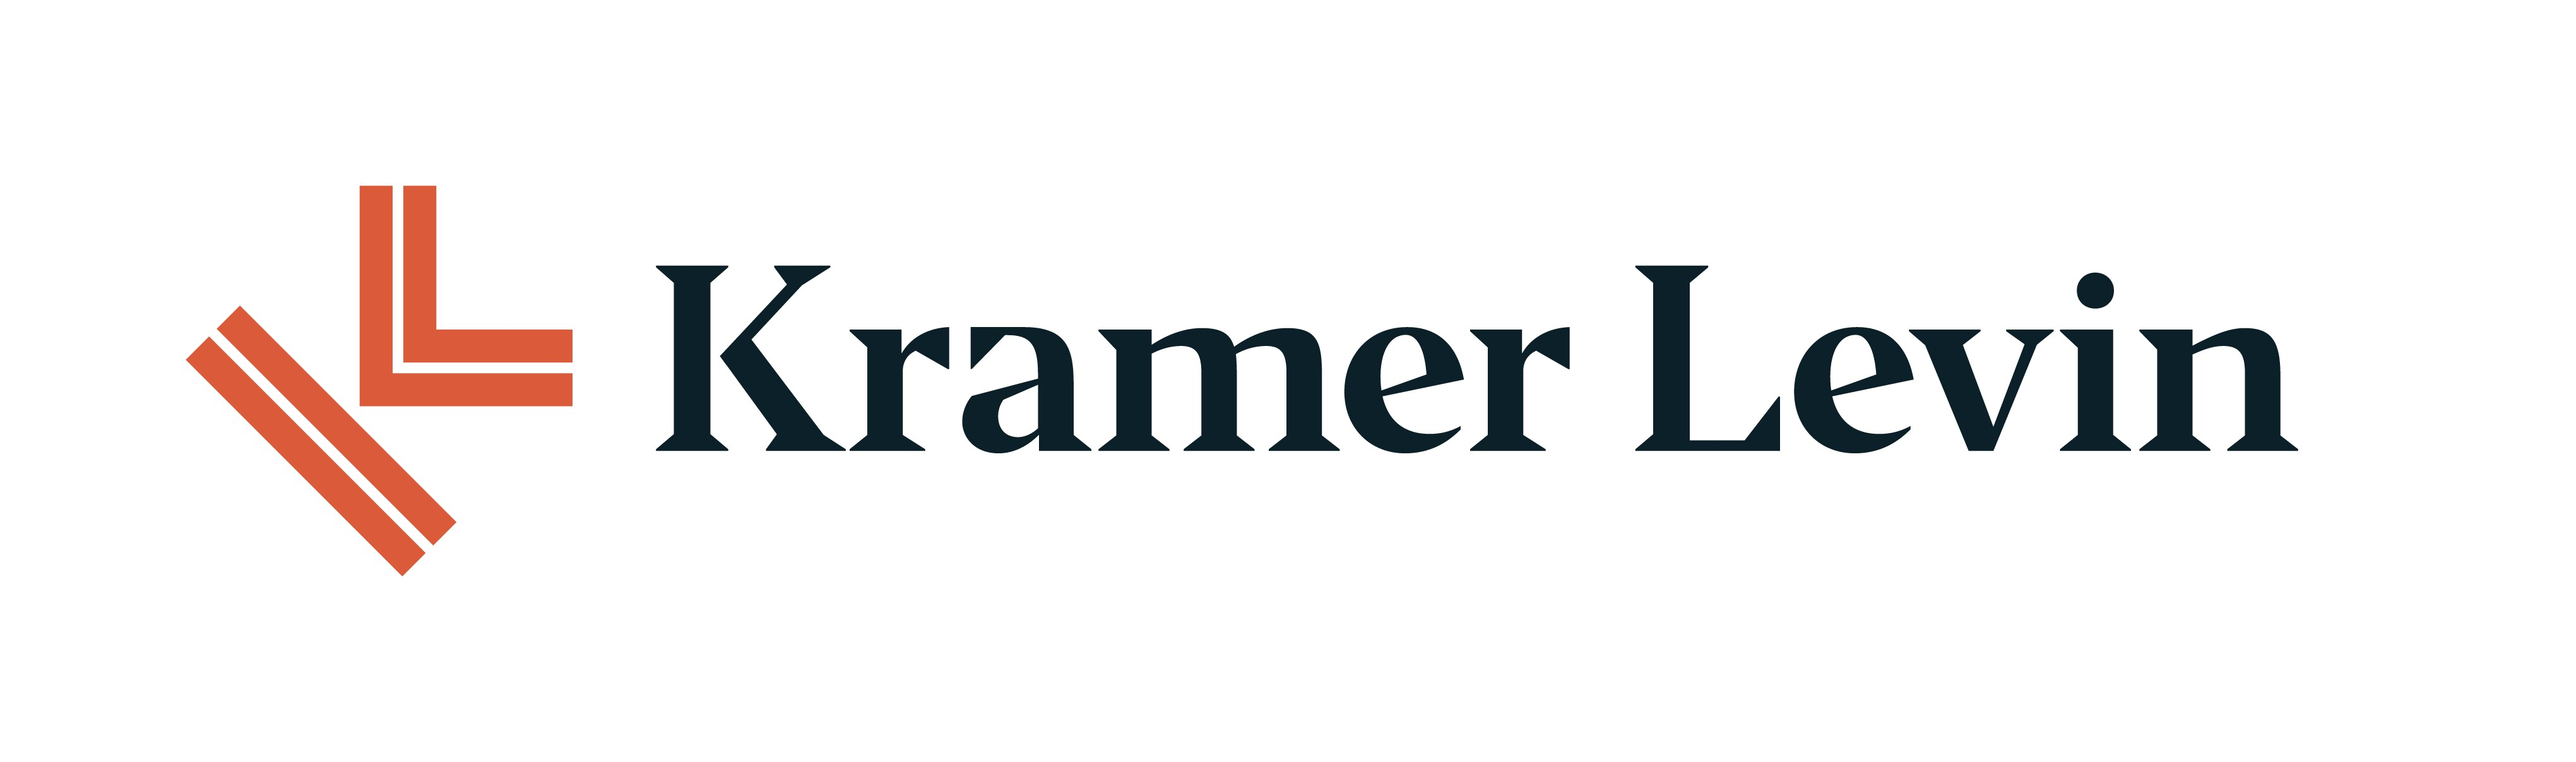 2543_Kramer Levin_Logo_Inline_RGB